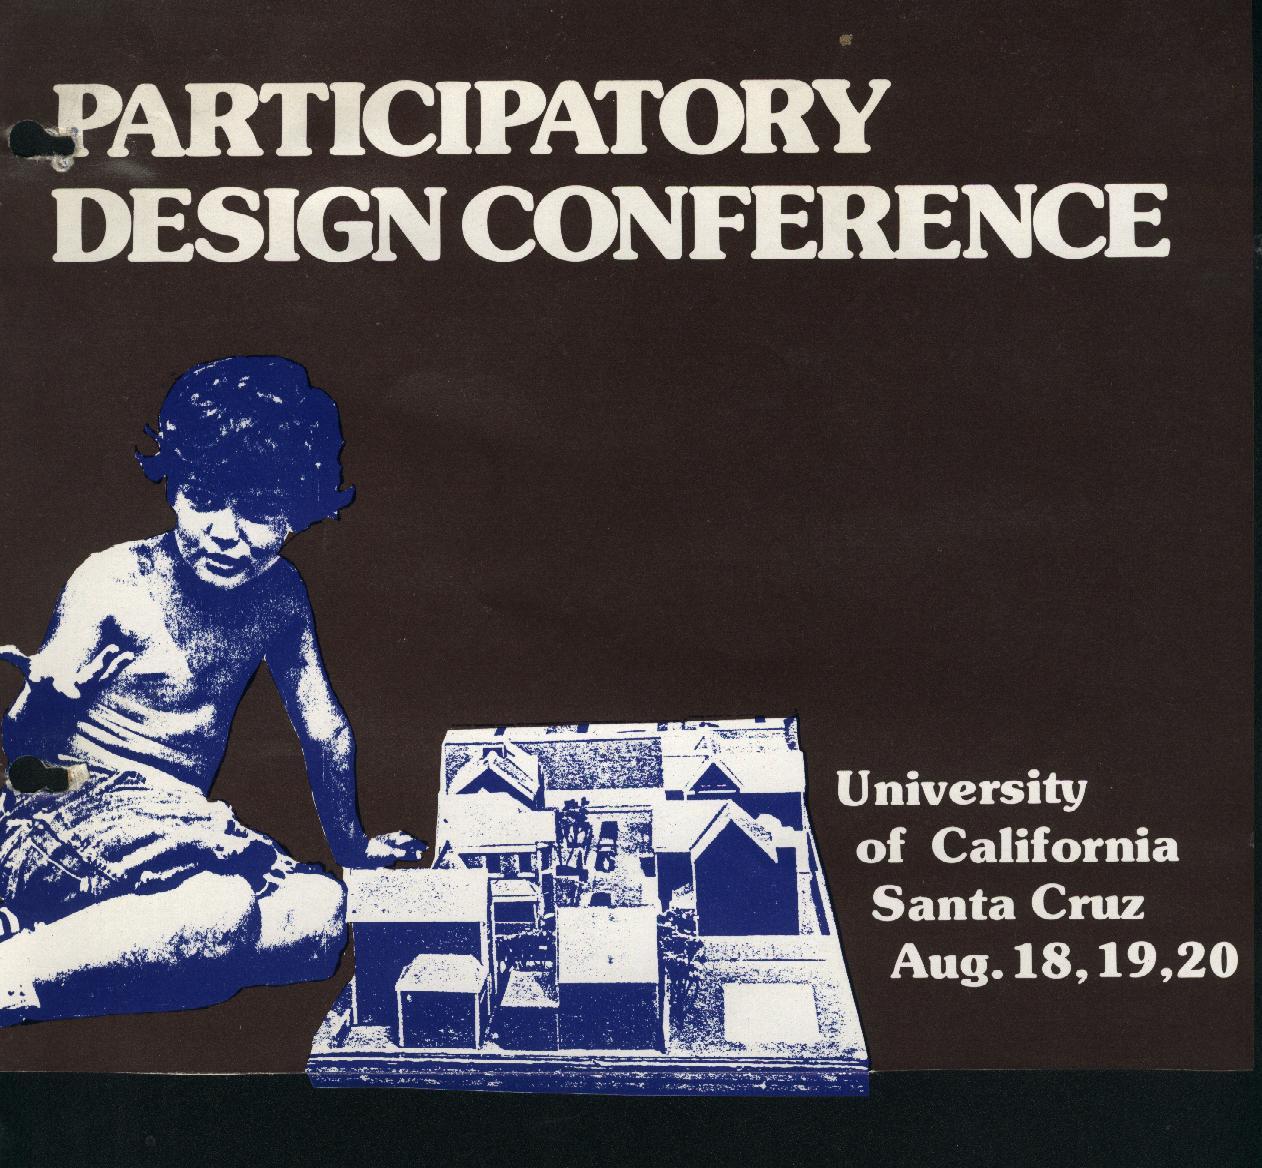 y design conference rome - photo#14